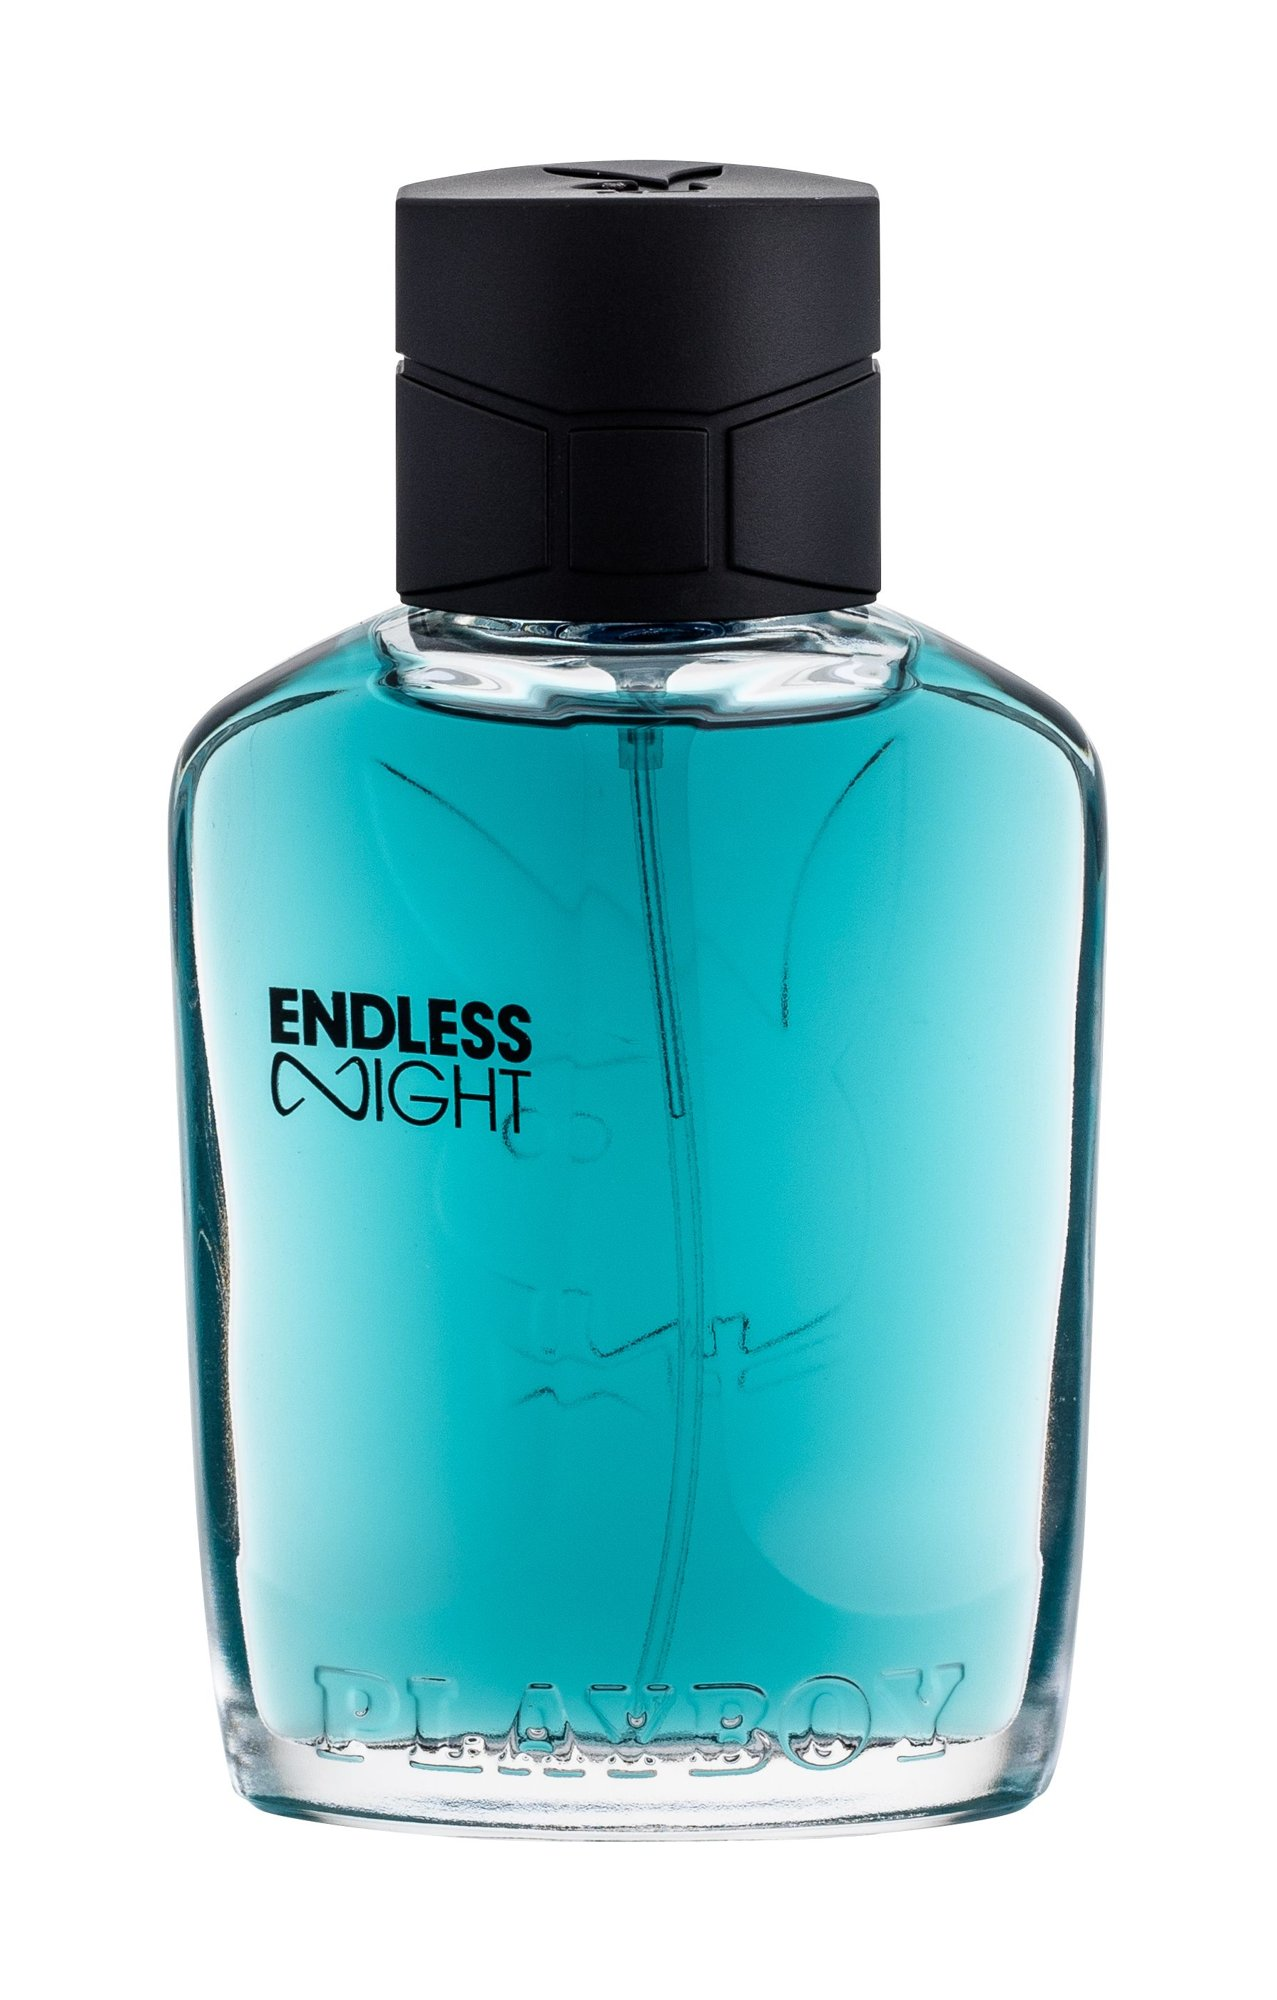 Playboy Endless Night Eau de Toilette 60ml